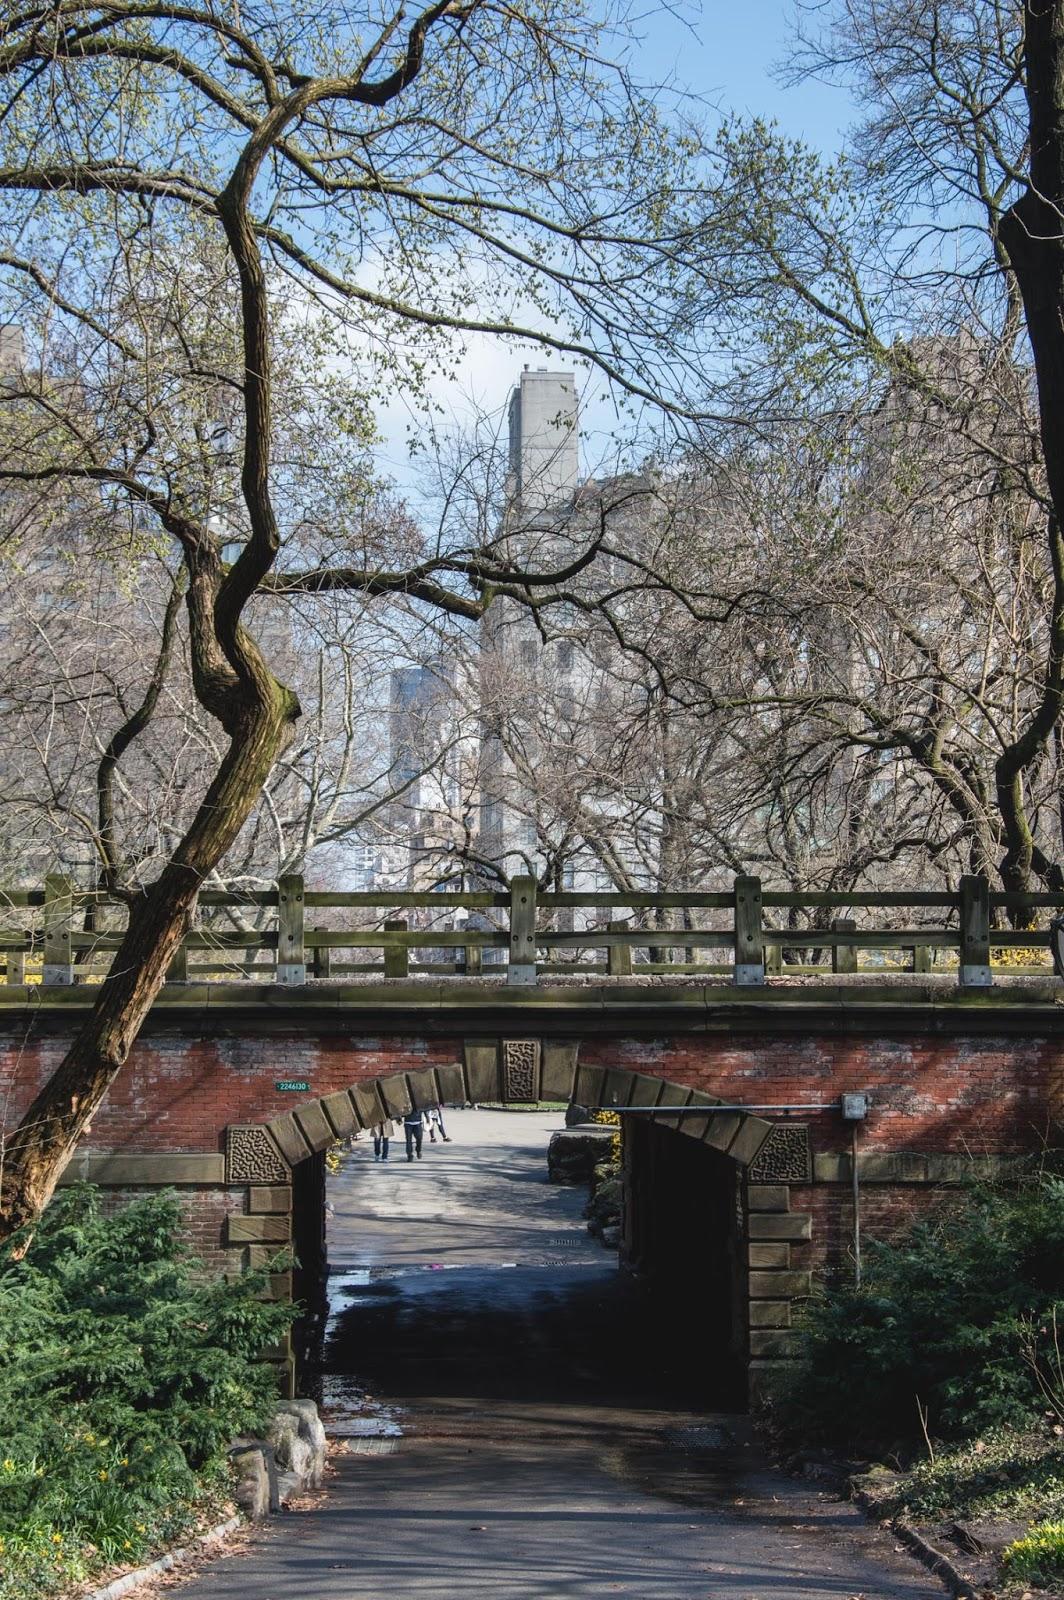 Old bridge in the Central Park